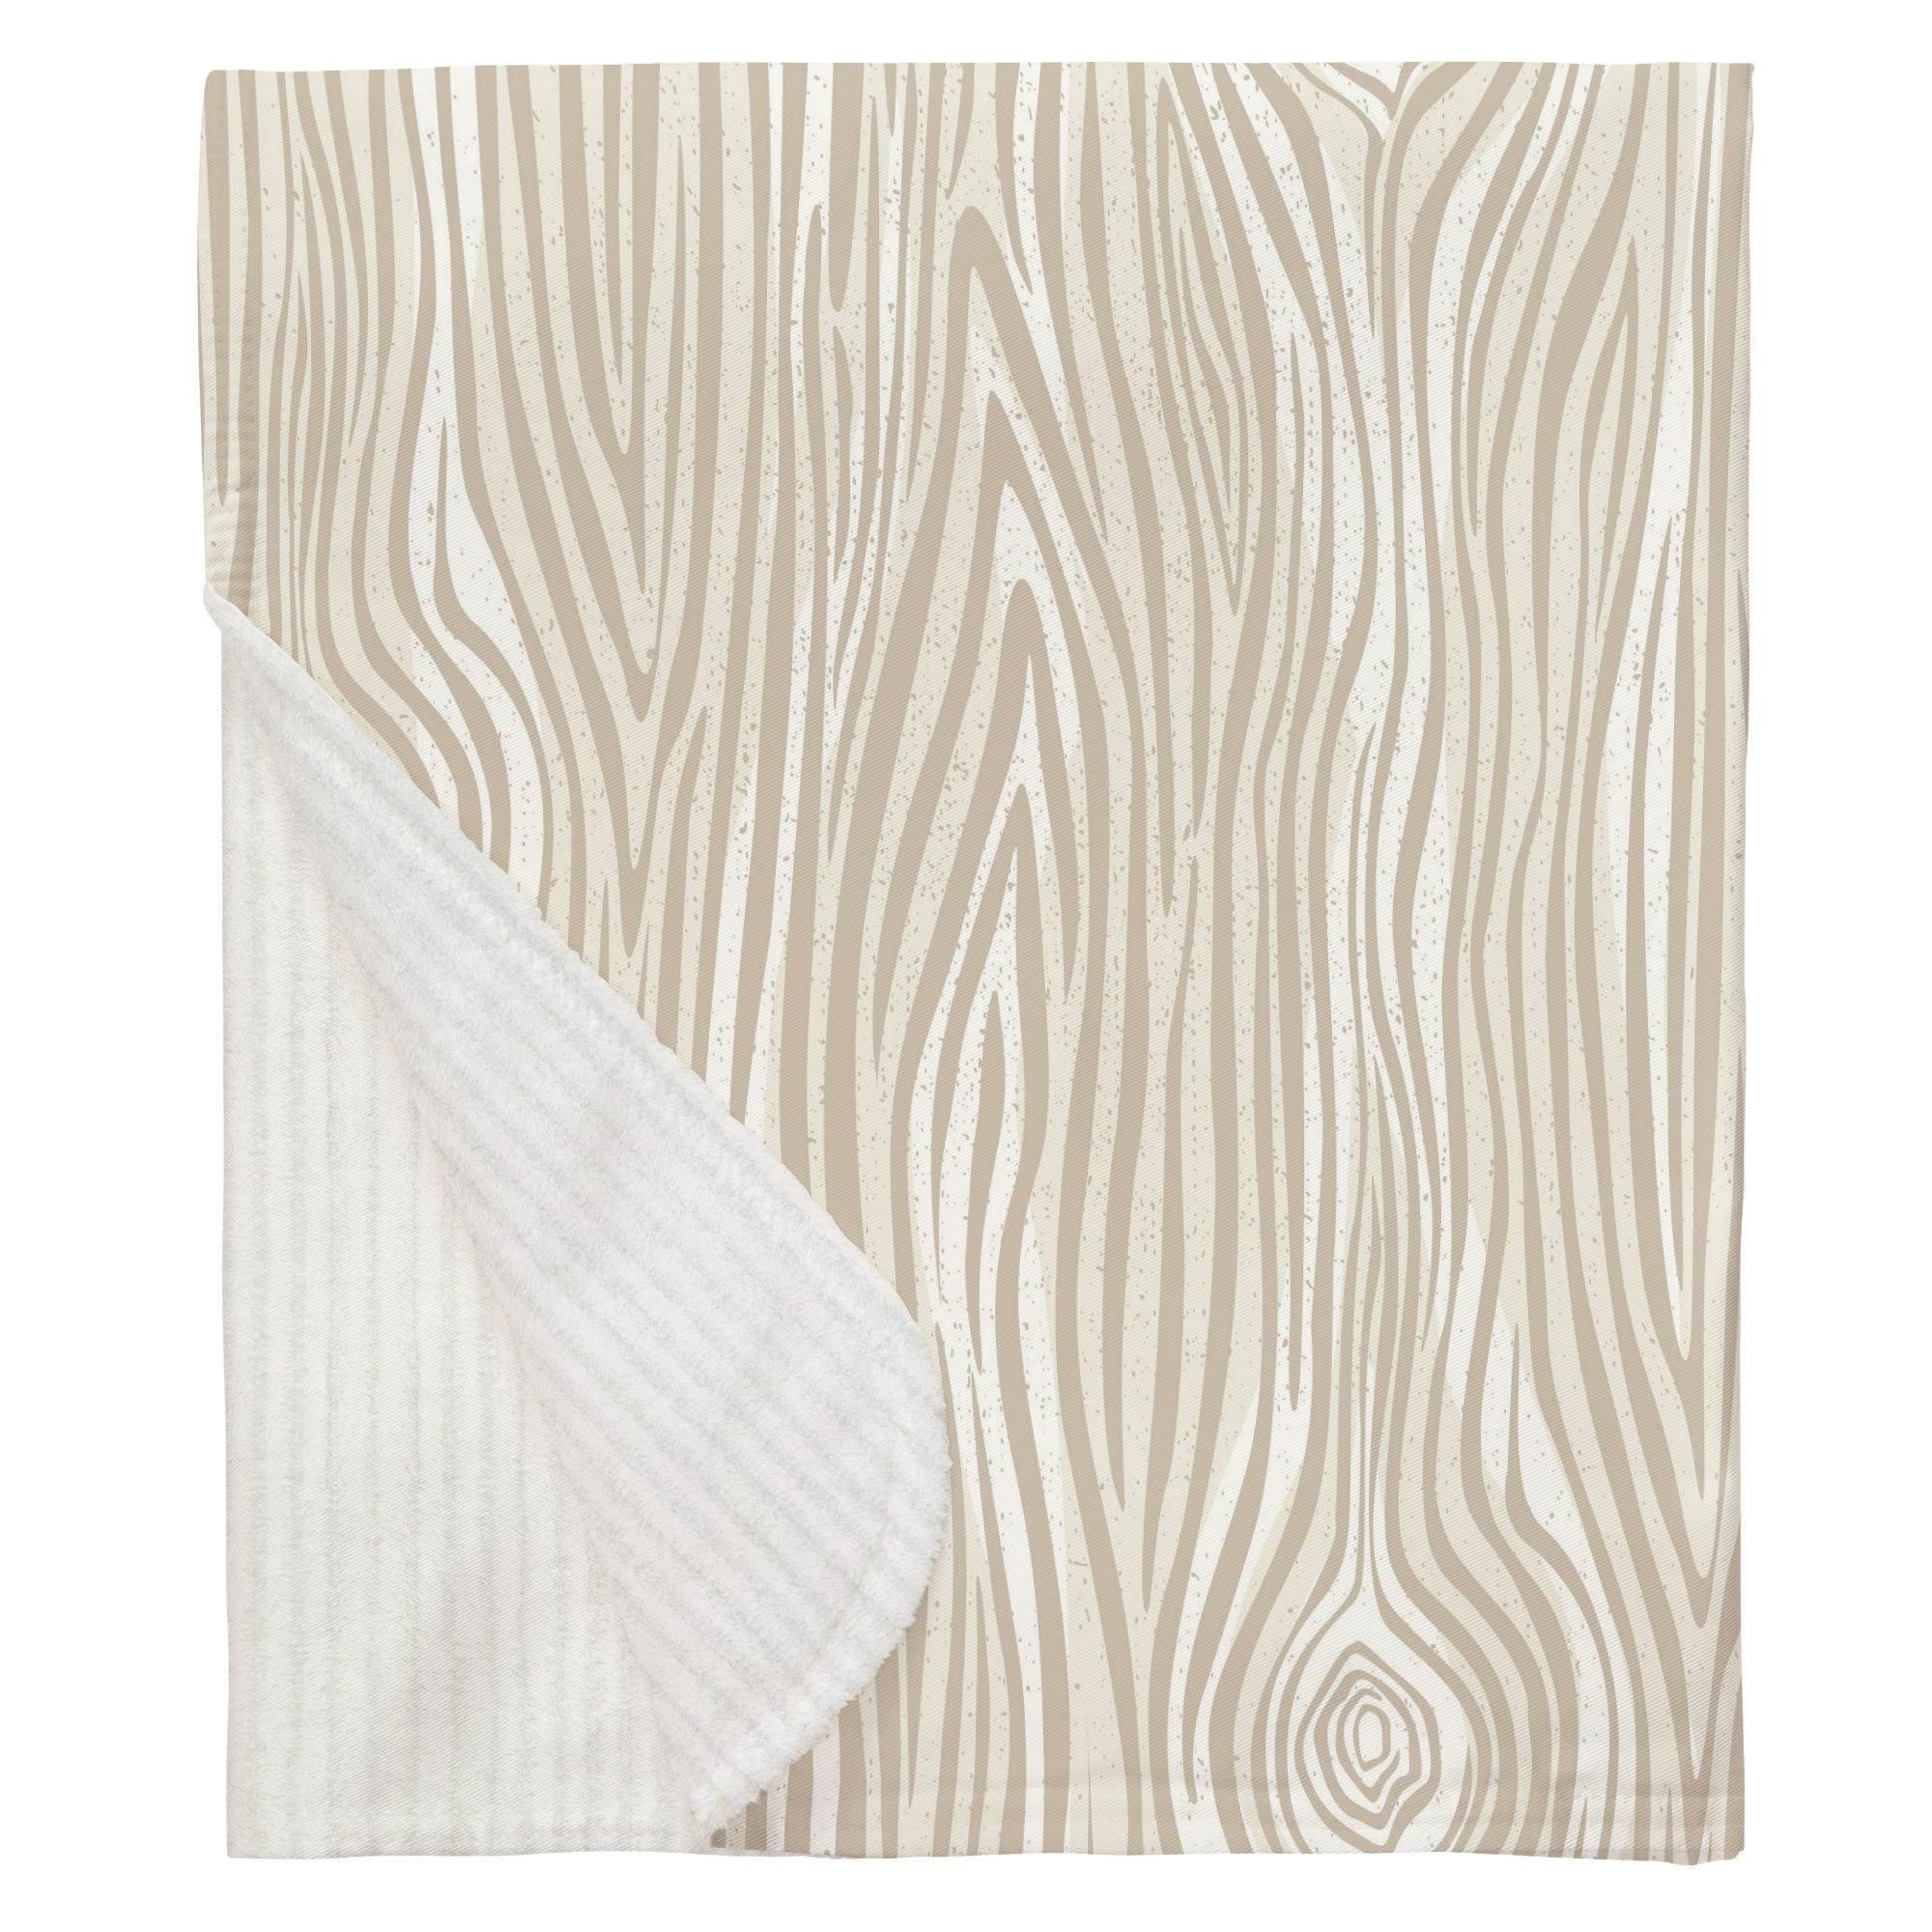 Carousel Designs Taupe Large Woodgrain Crib Blanket